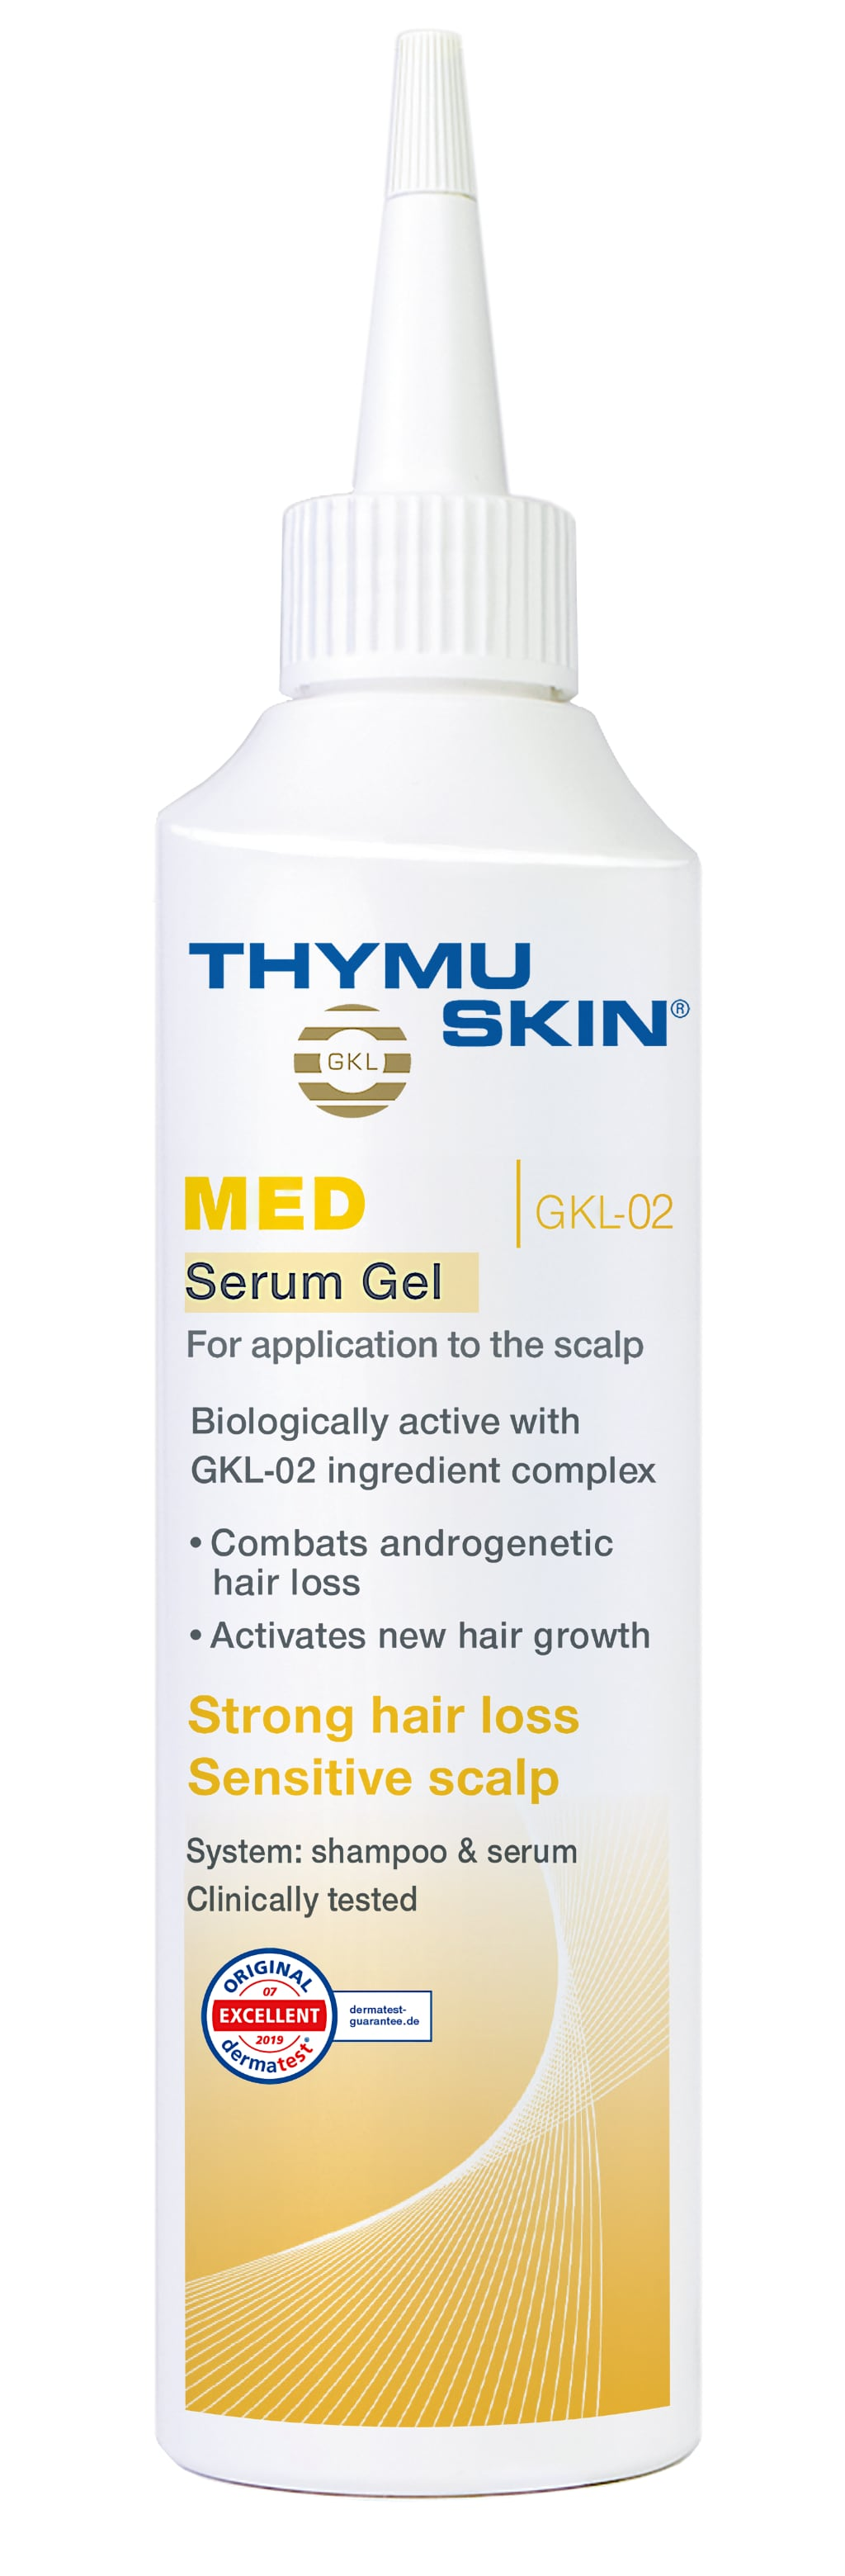 Thymuskin Med Serum Gel